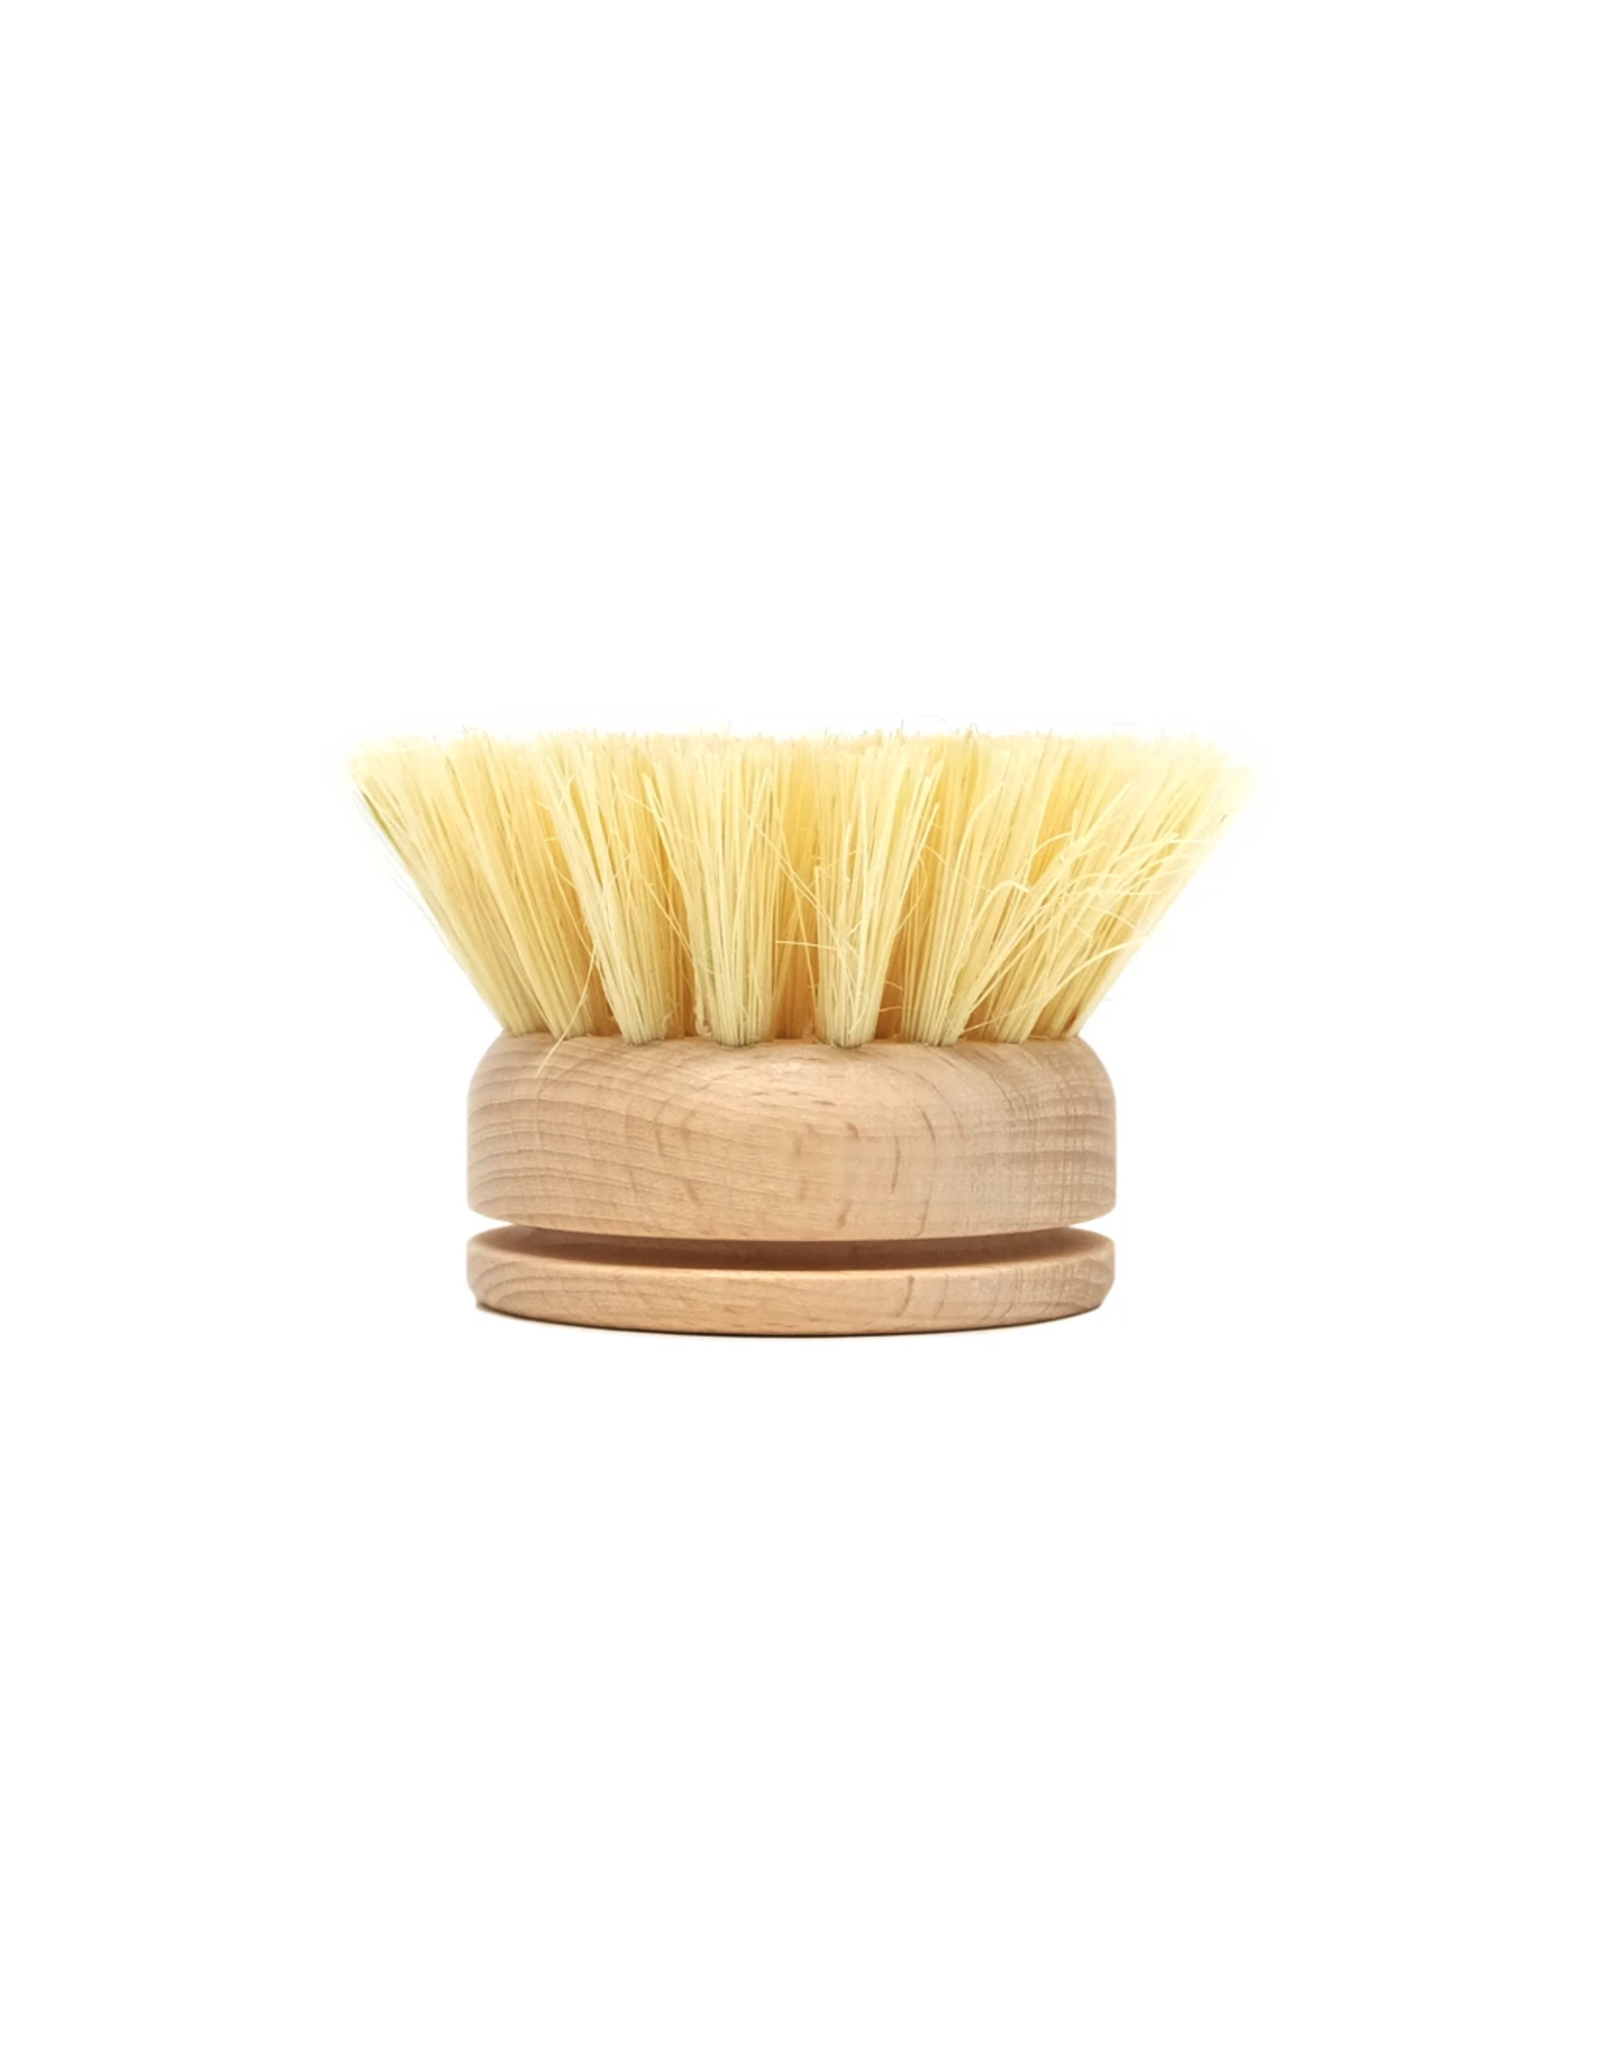 Maison Soleil Beech Wood Dish Brush